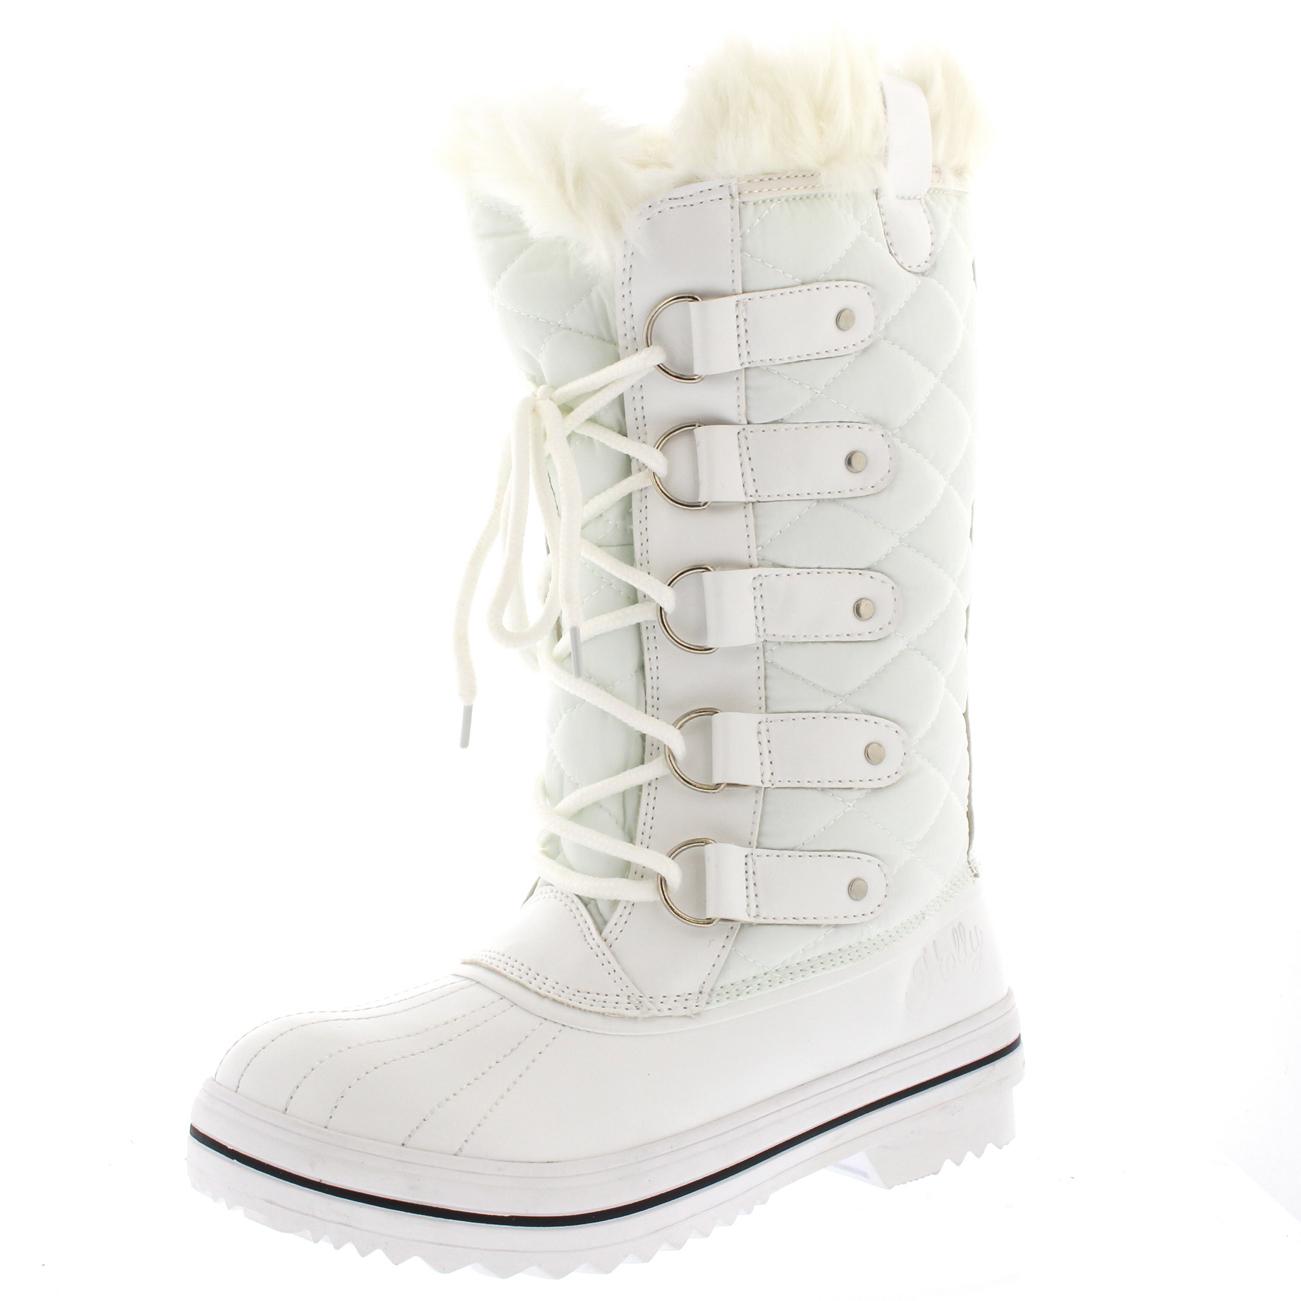 Perfect Pajar Grip Tall Women39s Snow Boots Waterproof Outdoor Winter  EBay